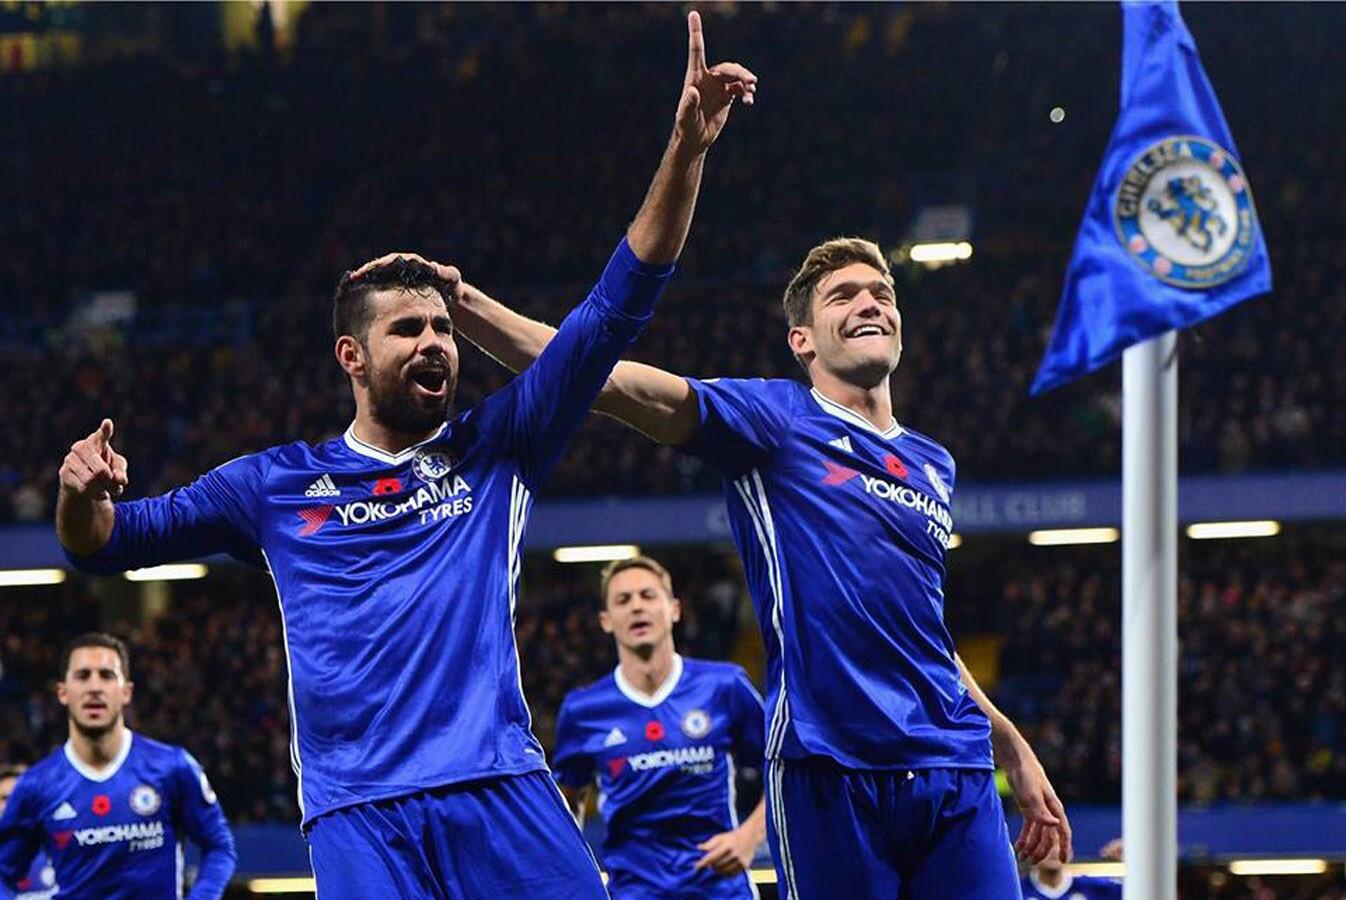 Premier: Chelsea 5 - 0 Everton